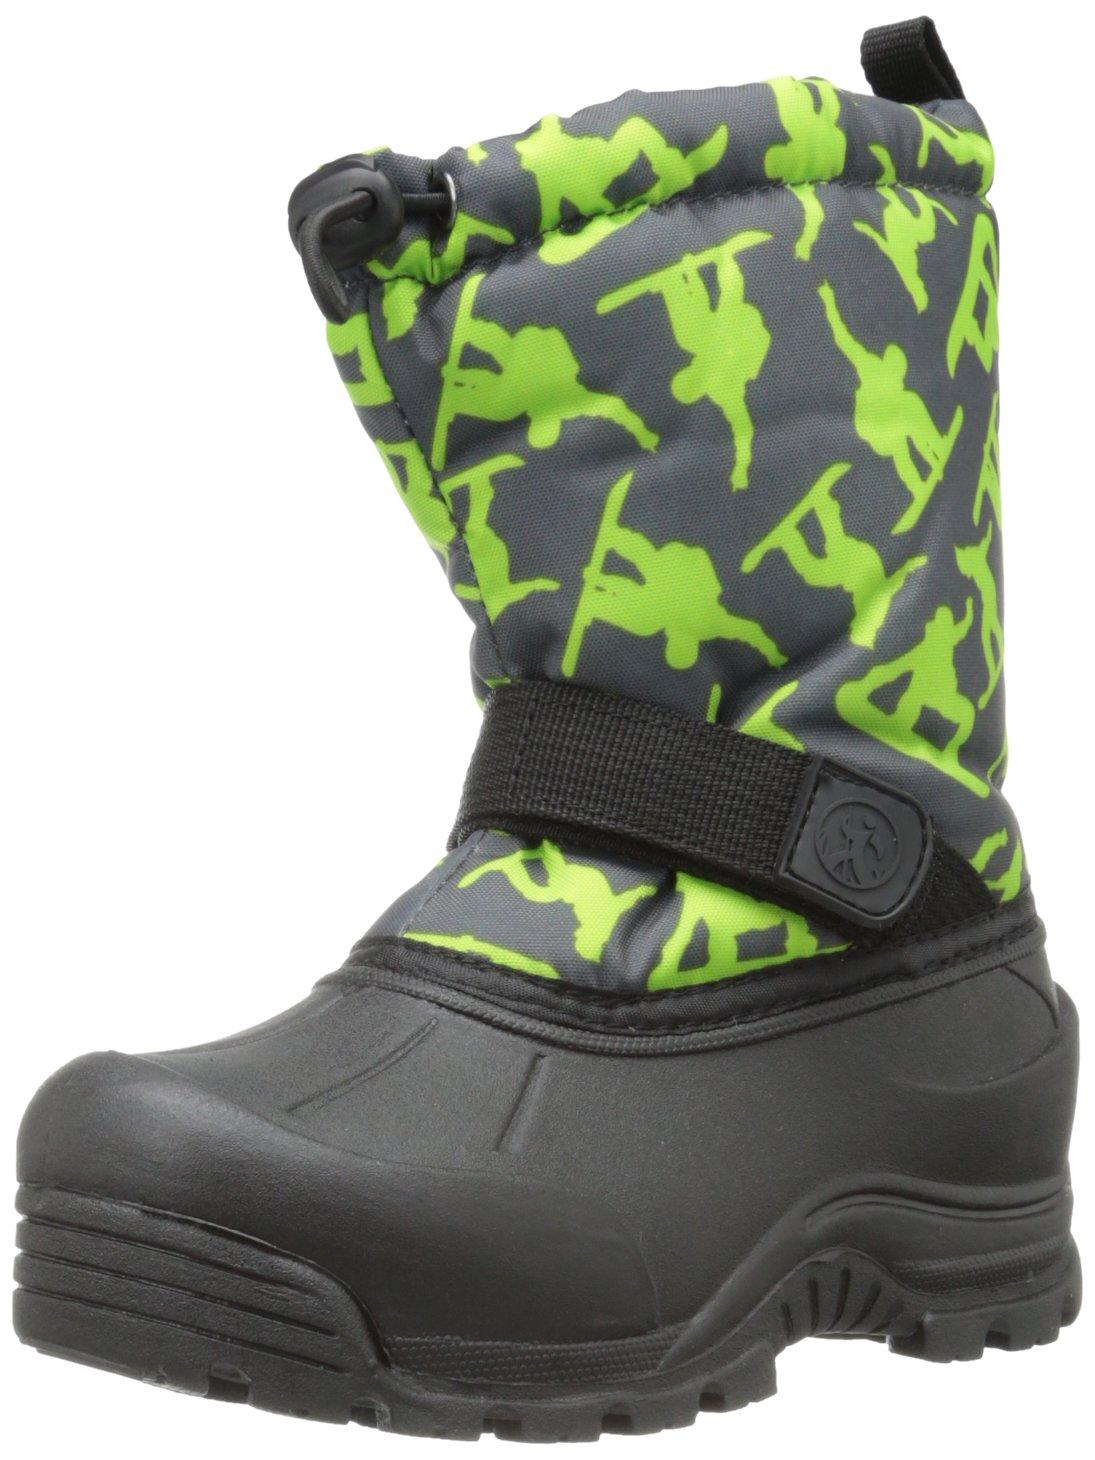 Northside Frosty Winter Boot (Toddler/Little Kid/Big Kid),Dark Grey/Green,1 M US Little Kid